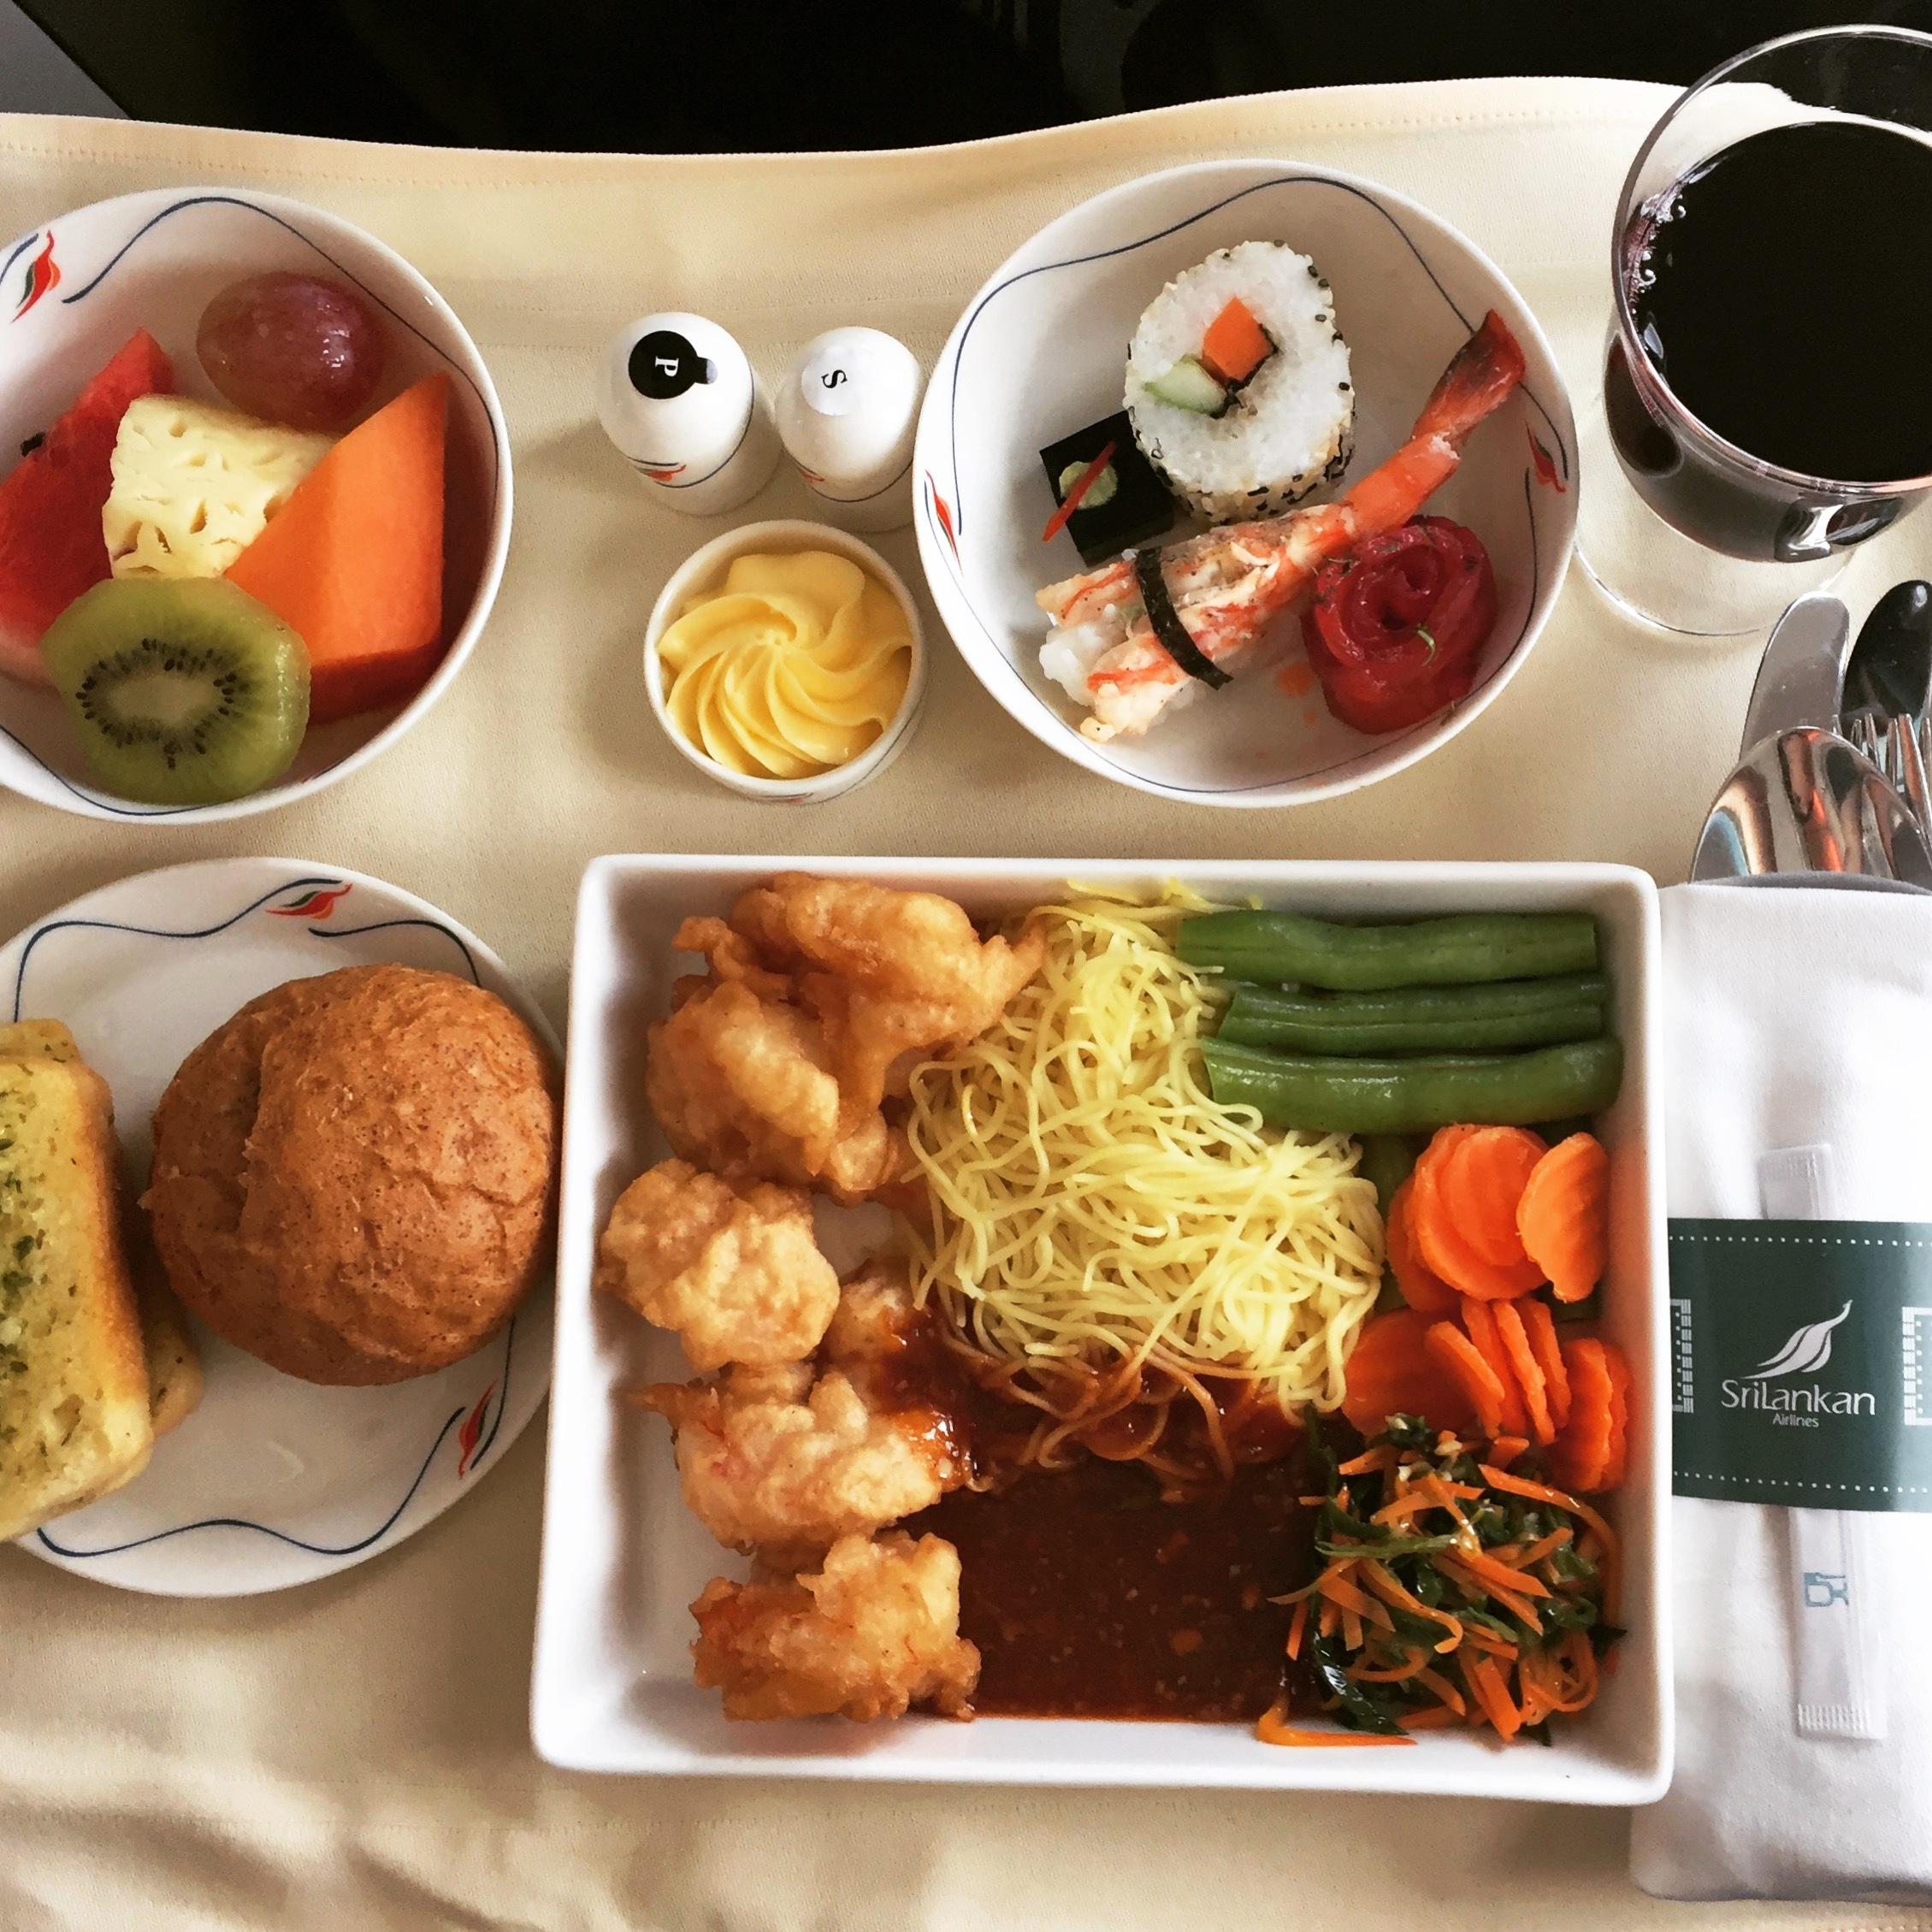 Fly with Srilankan, Fly srilankan airlines, Sri lankan airlines